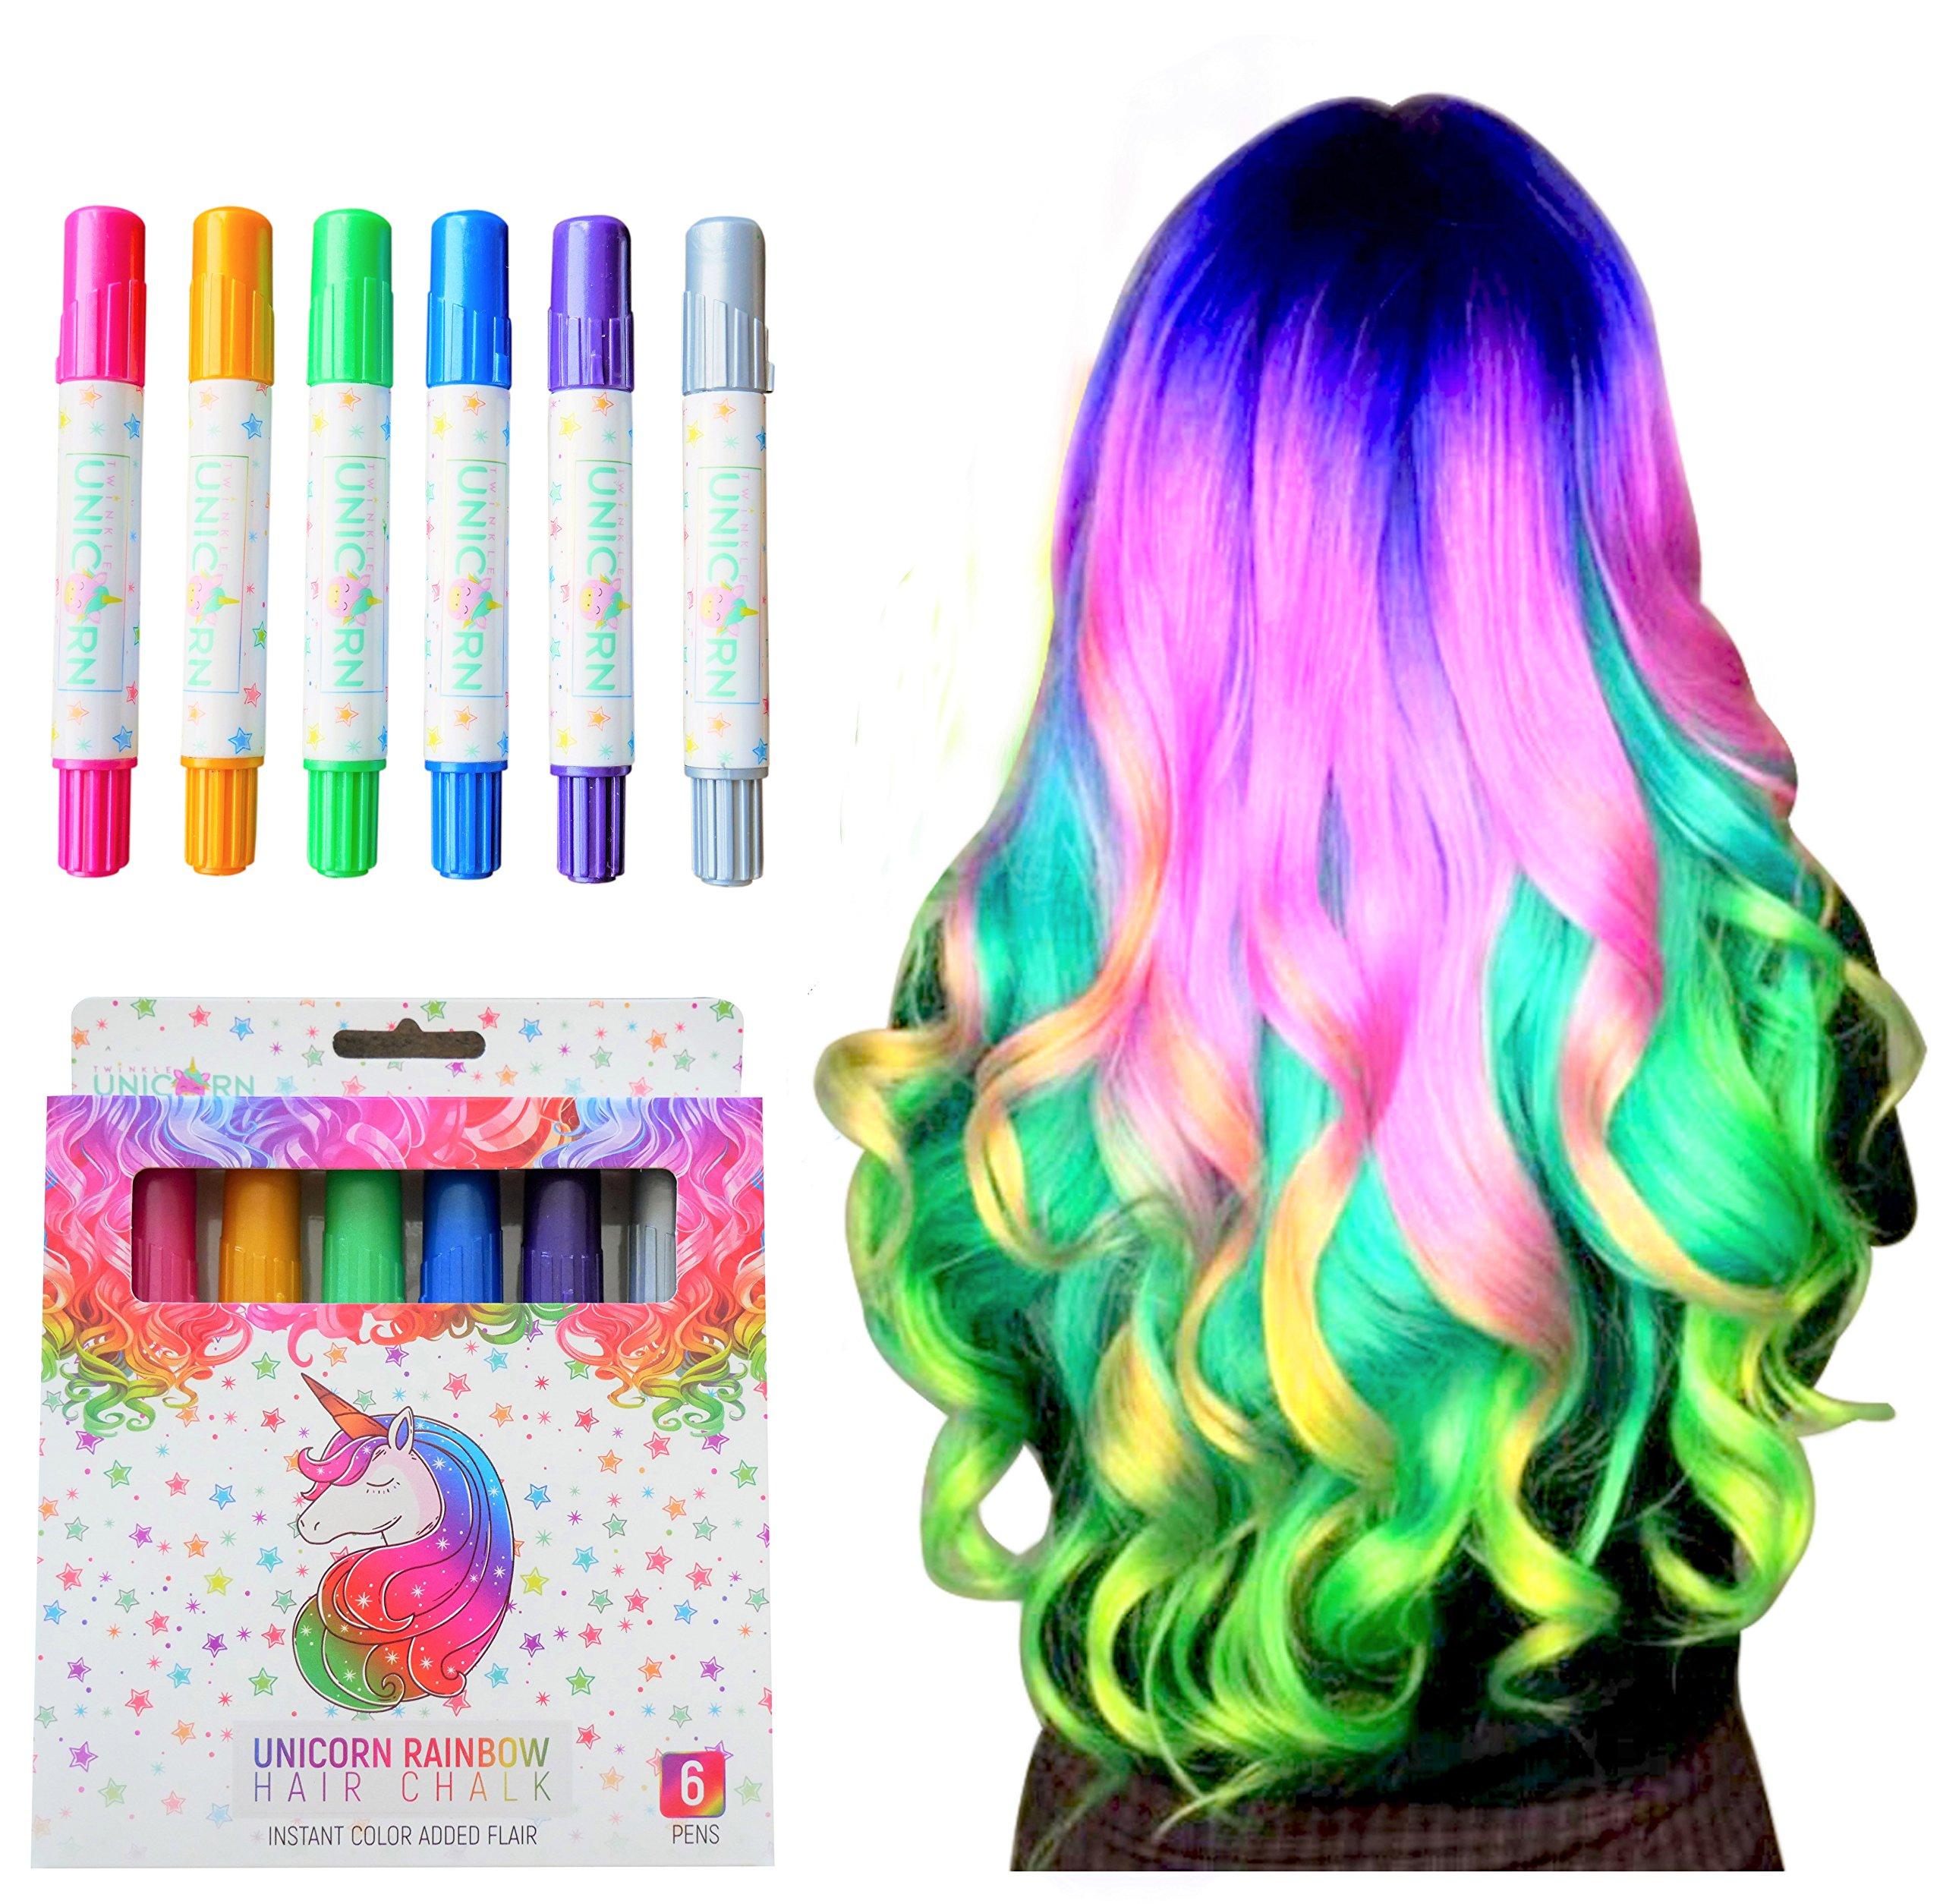 Girls Hair Chalk, Rainbow Hair Chalk, Unicorn Hair Chalk Pens by Twinkle Unicorn